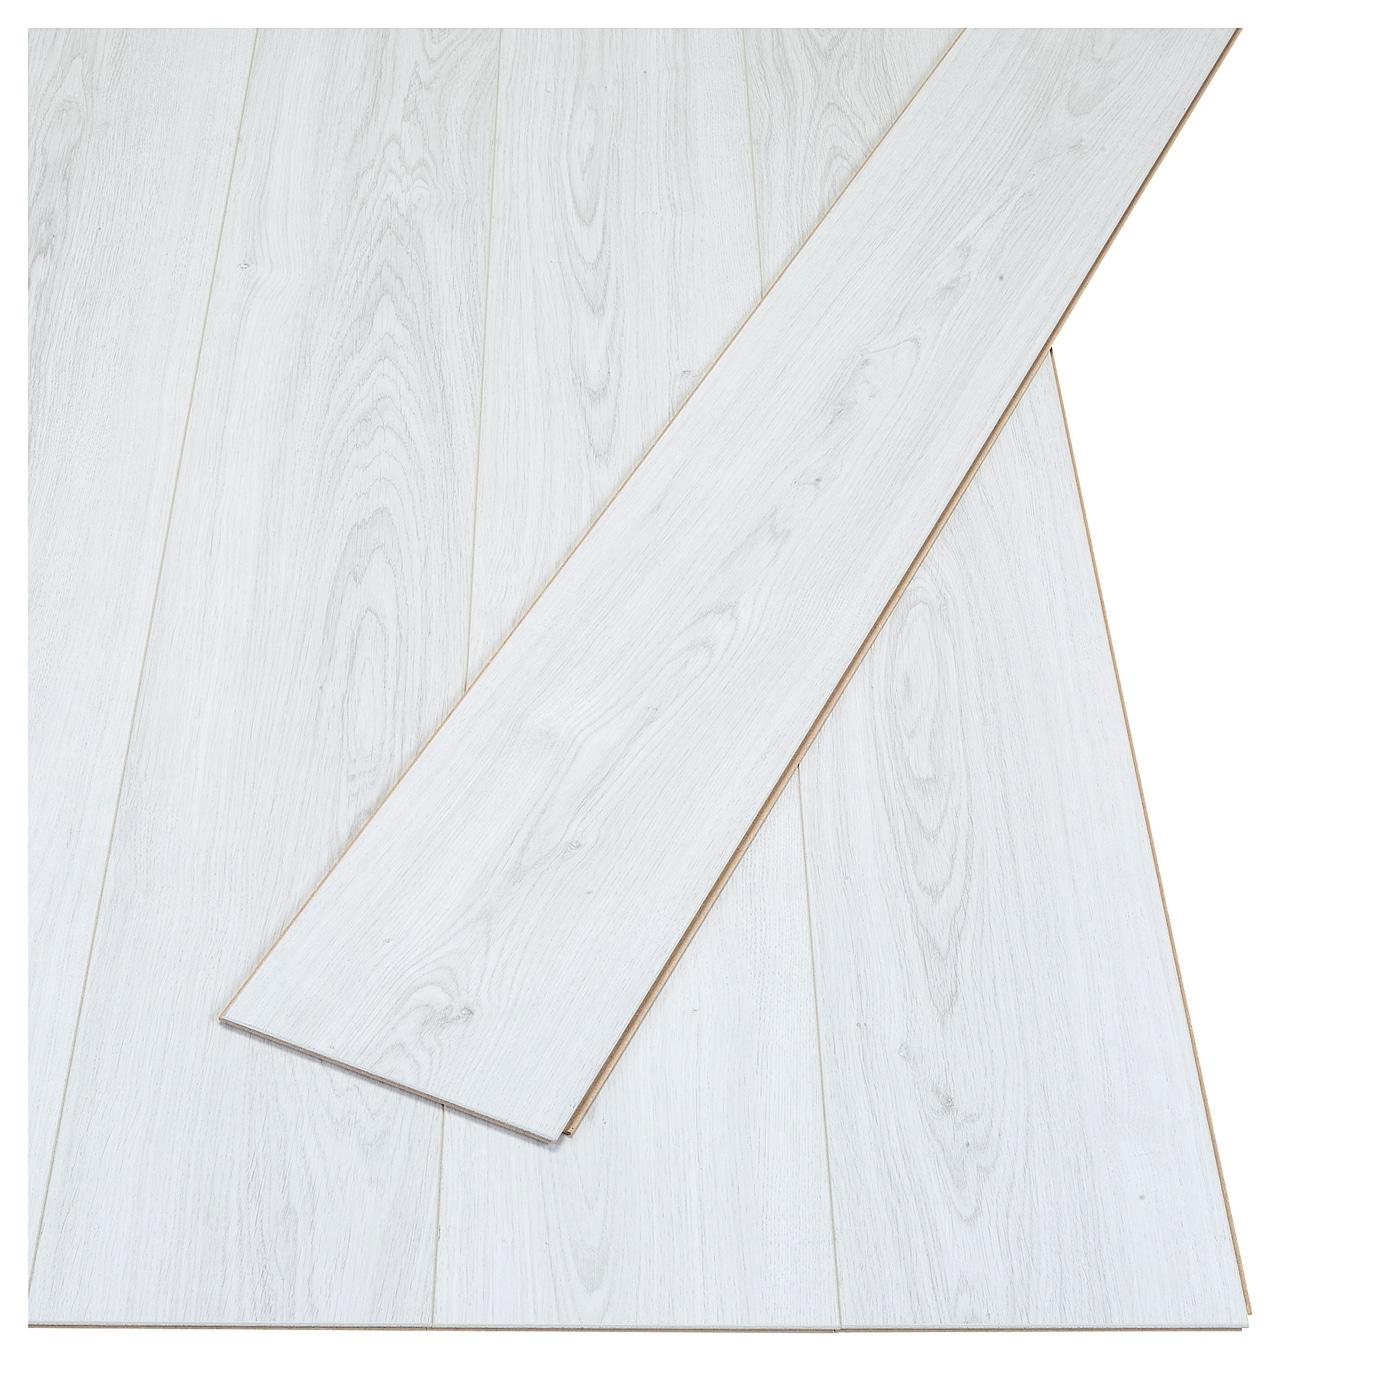 prÄrie laminated flooring oak effect/white 2.25 m² - ikea